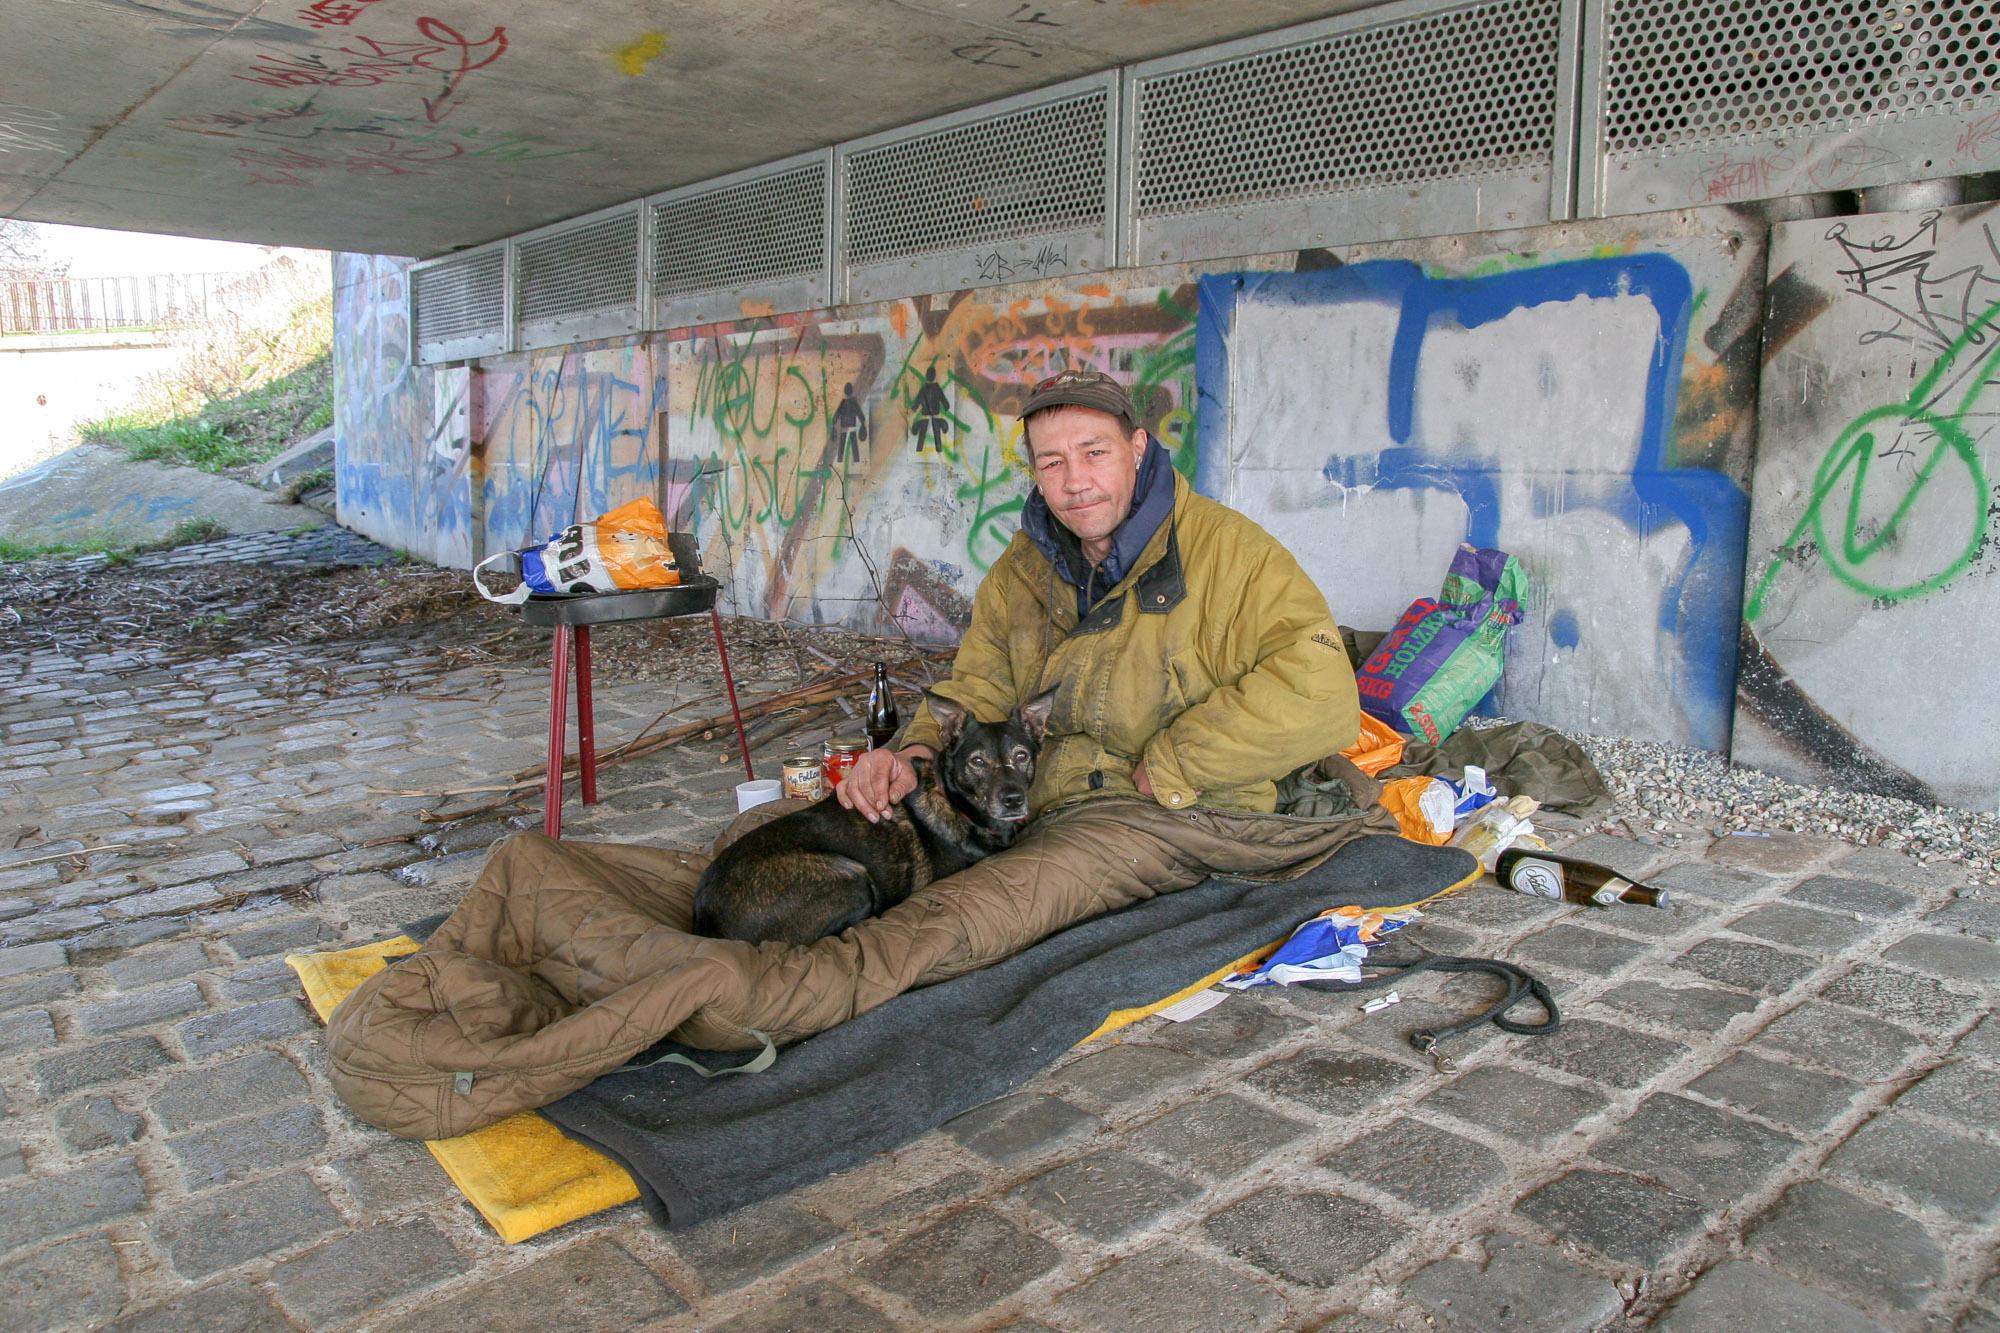 Obdachloser in Jena